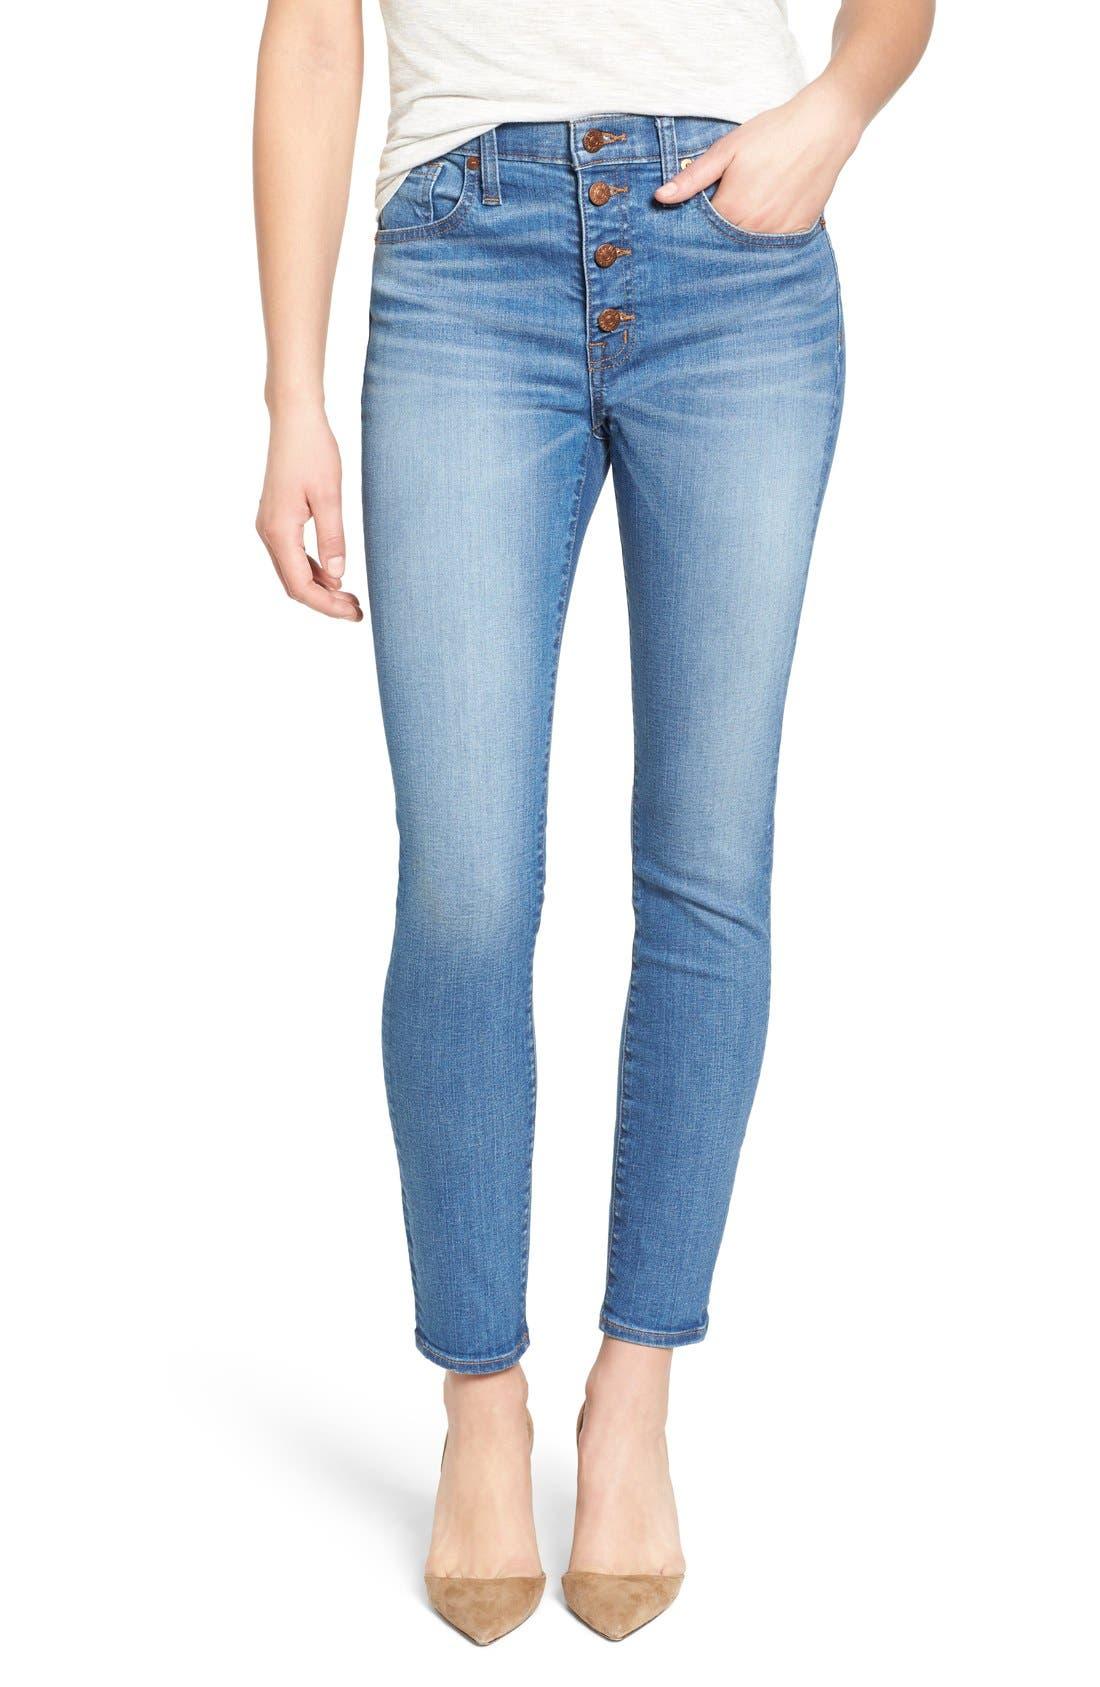 Main Image - Madewell 'High Riser - Button Through' Crop Skinny Skinny Jeans (Kearney Wash)